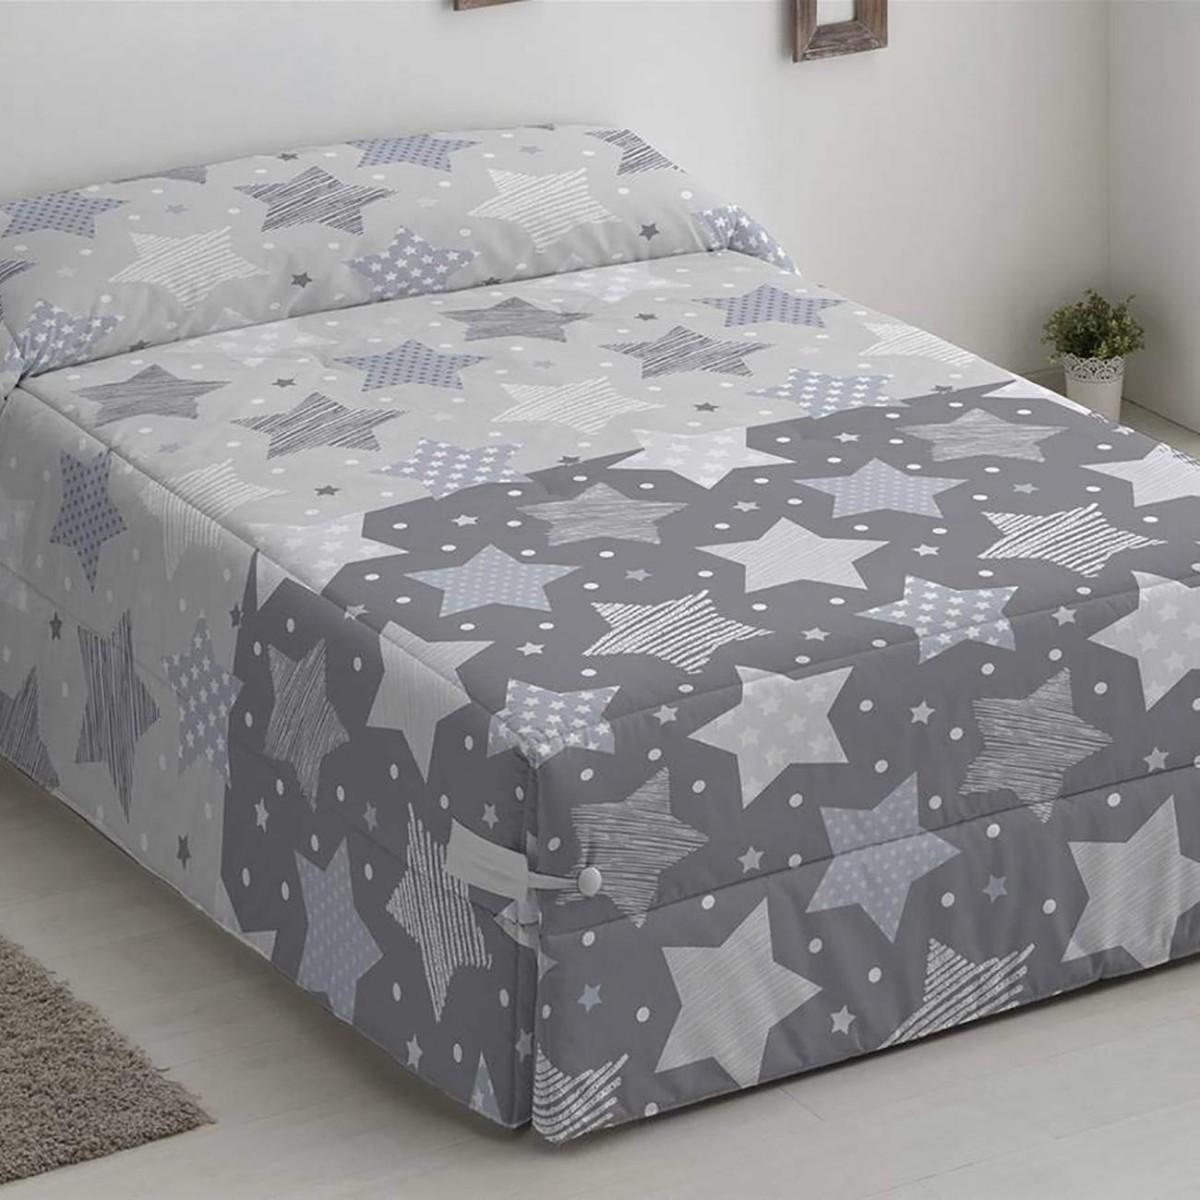 Conforter STARS Camatex